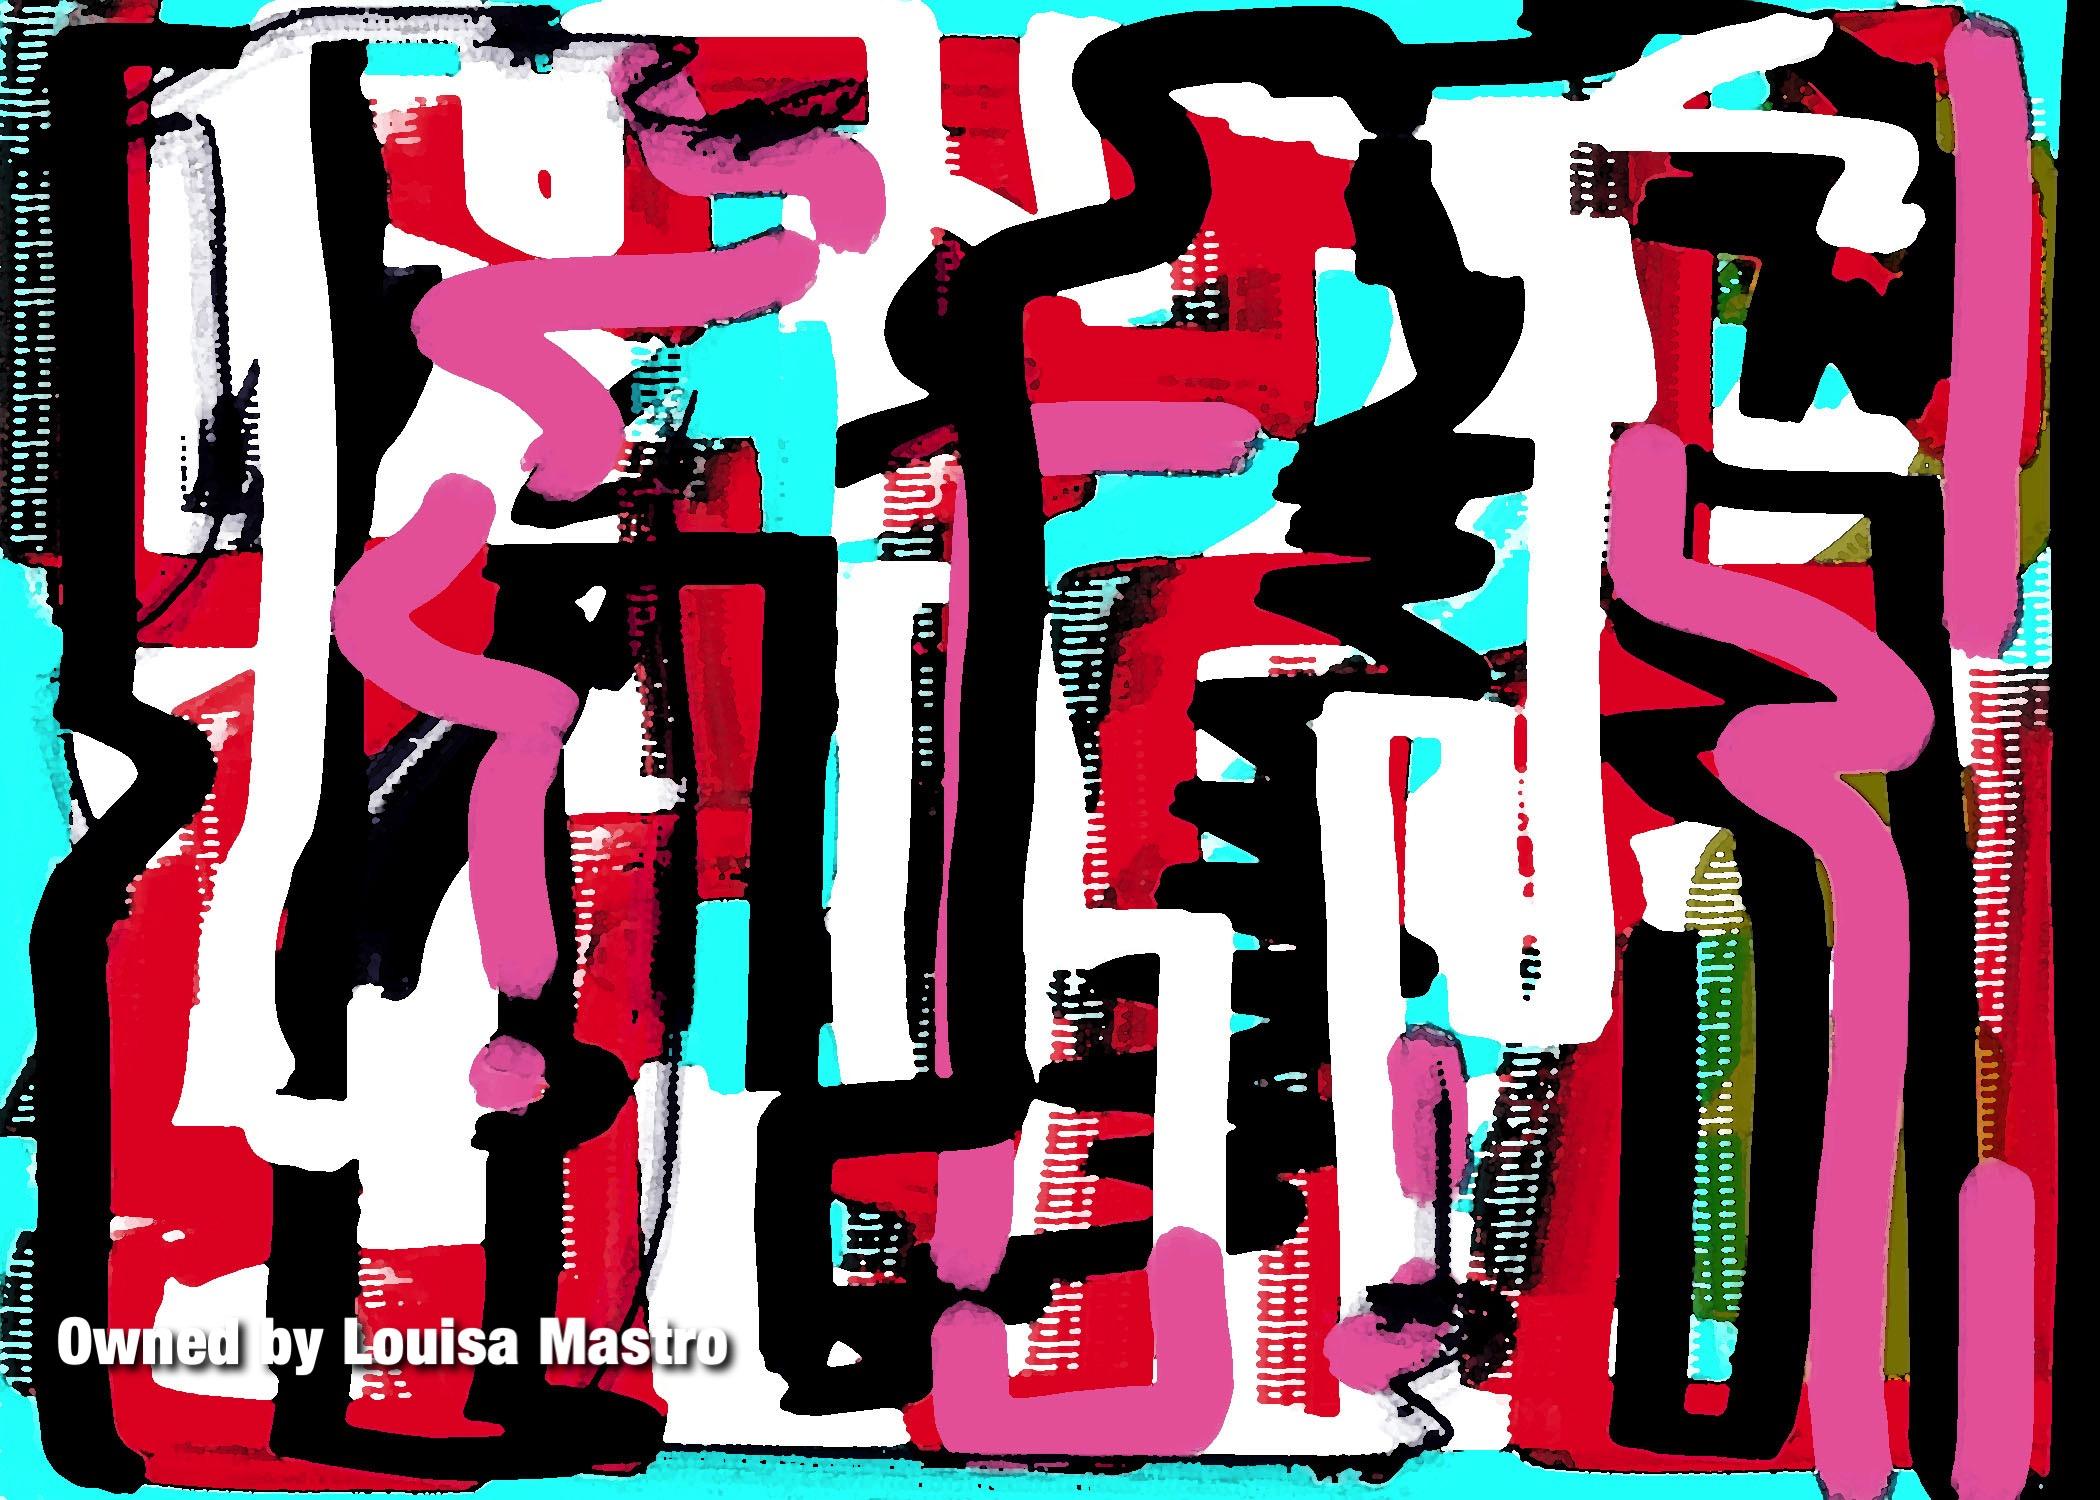 Guitar Wall (c) Louisa Mastro